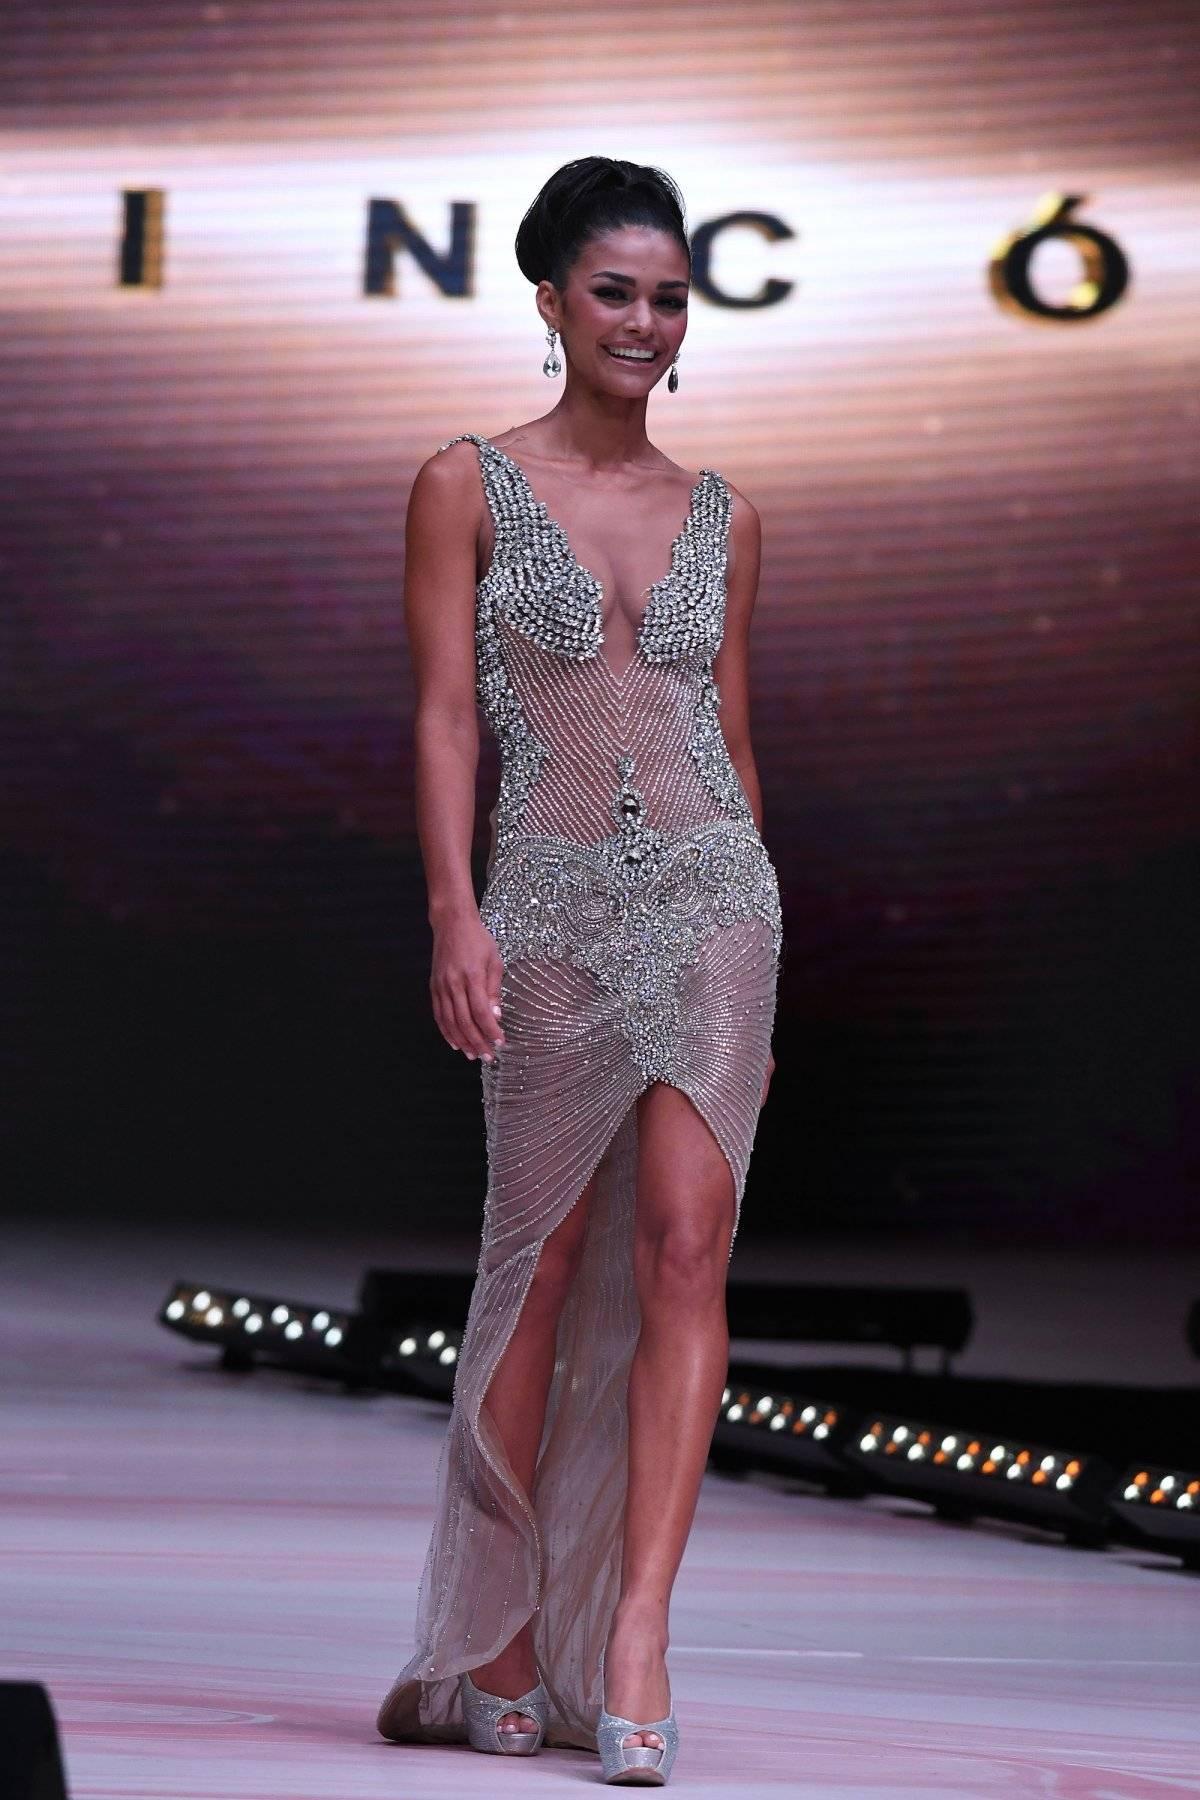 Miss Rincón - Kiara Liz Ortega